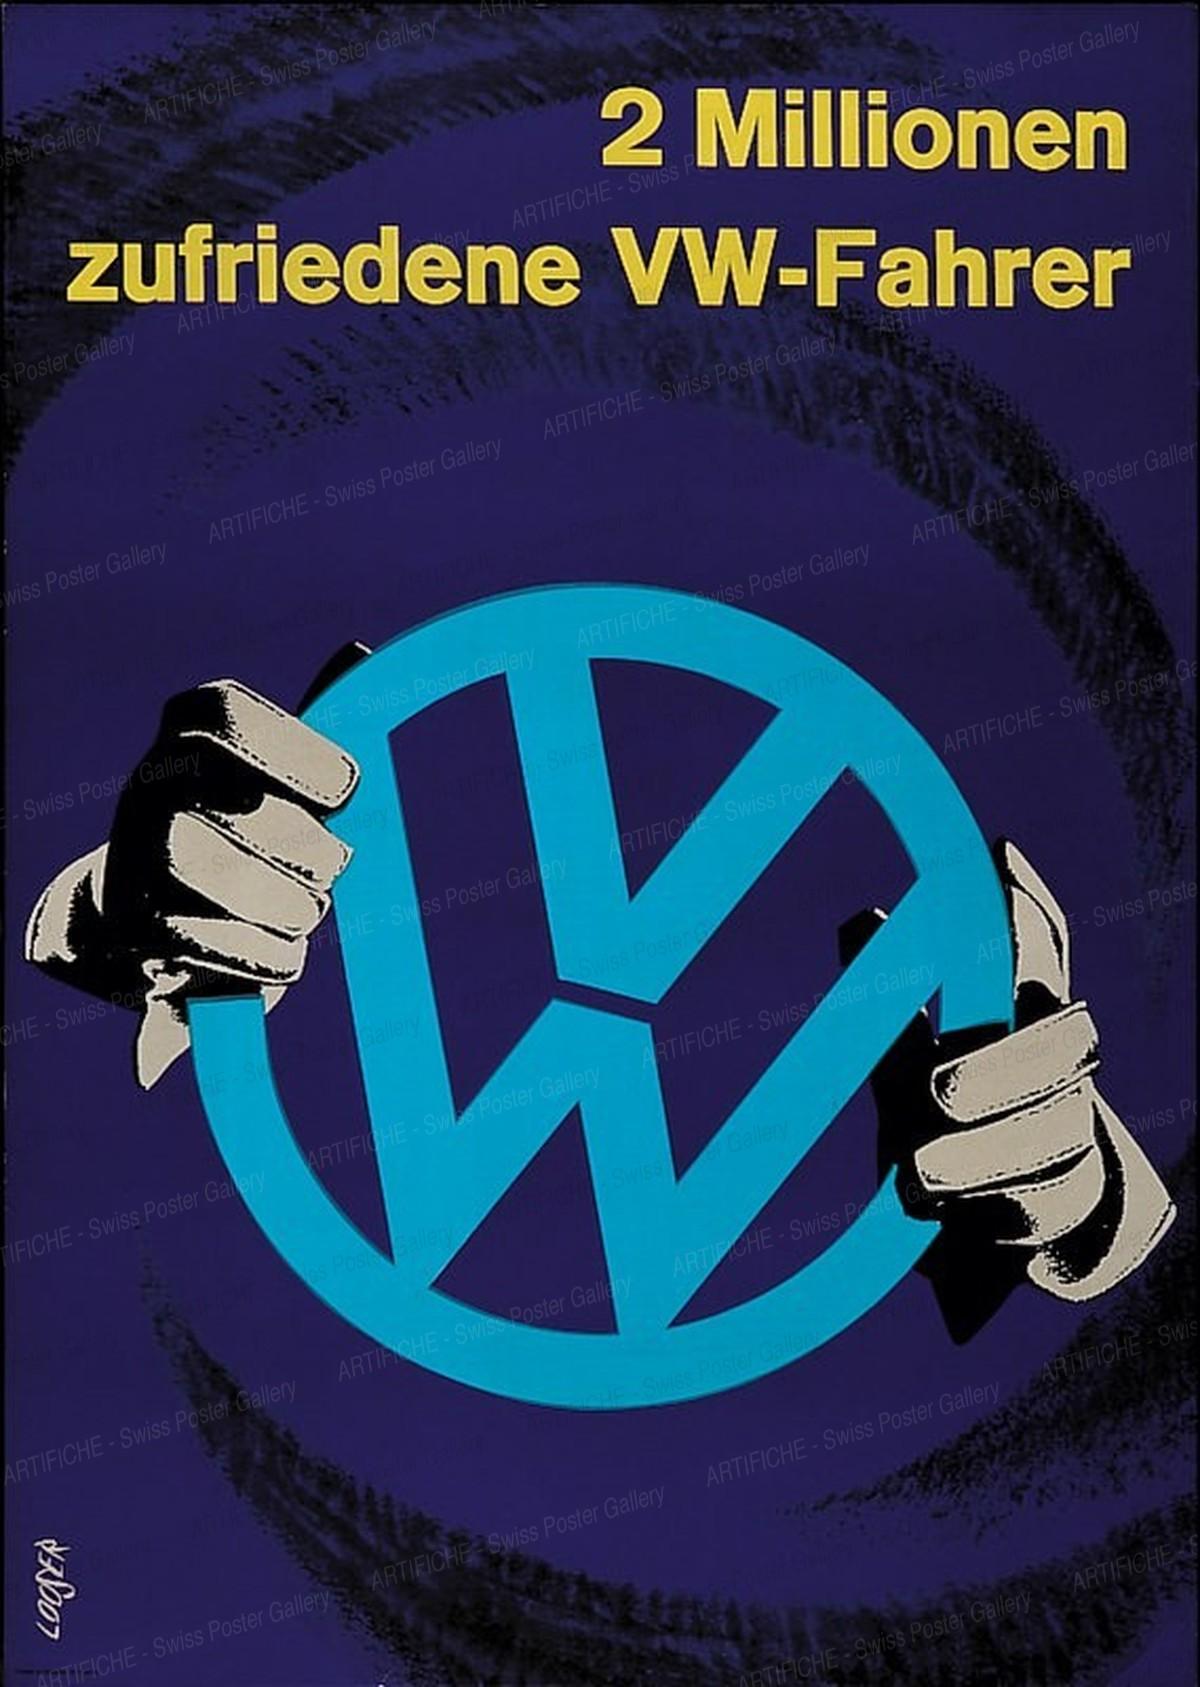 VW – 2 Millionen zufriedene VW-Fahrer, Hans Looser